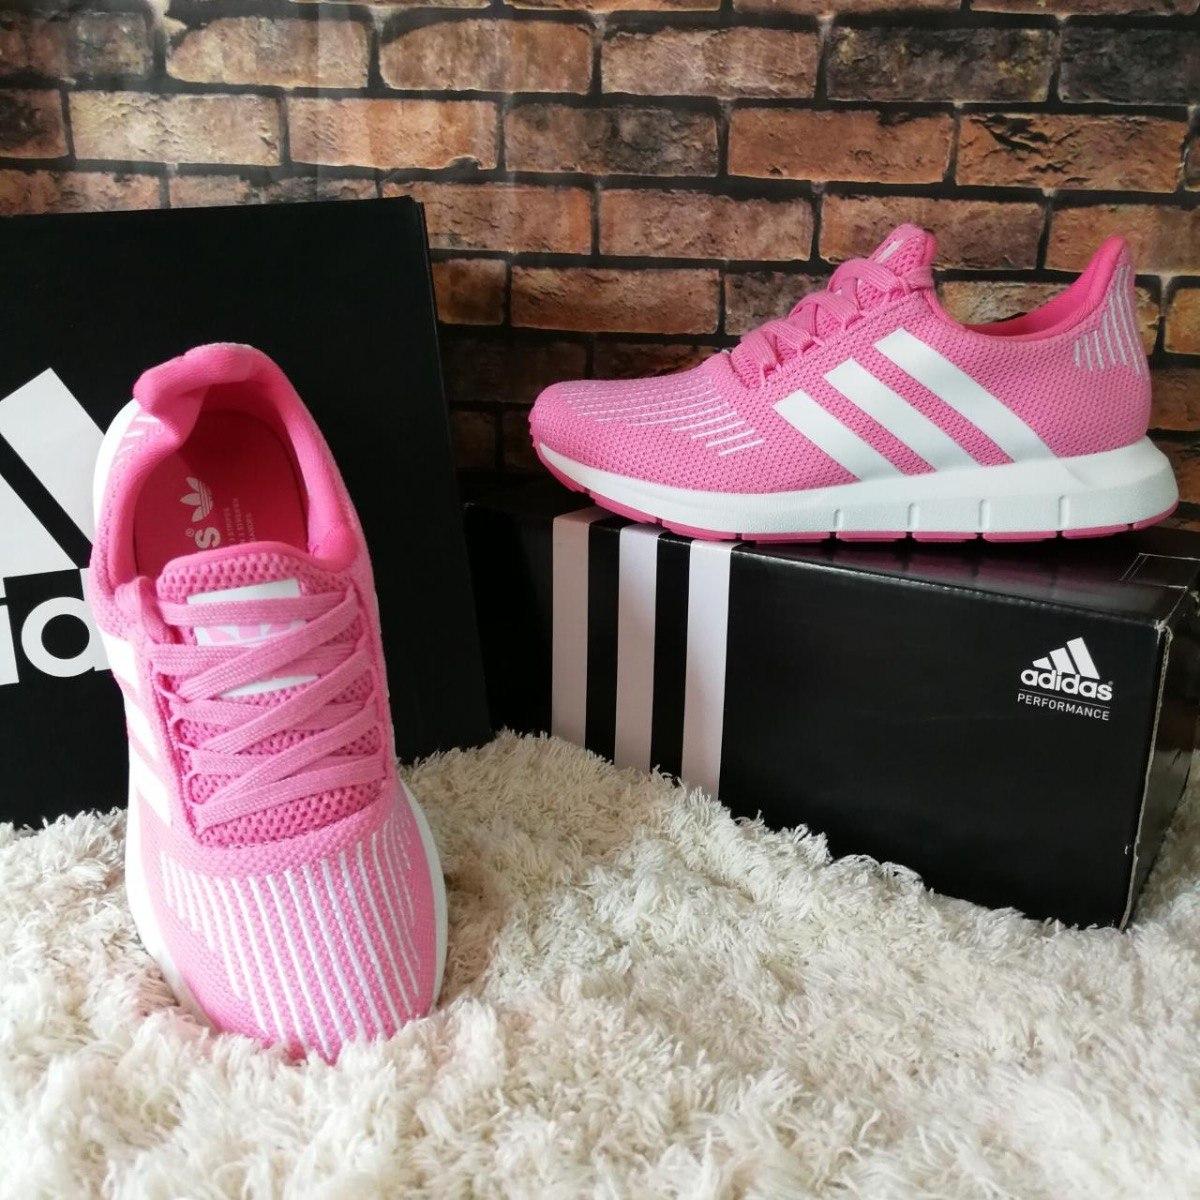 0e937b9b97cbc tenis zapatillas adidas swift run rosada blanca mujer env gr. Cargando zoom.